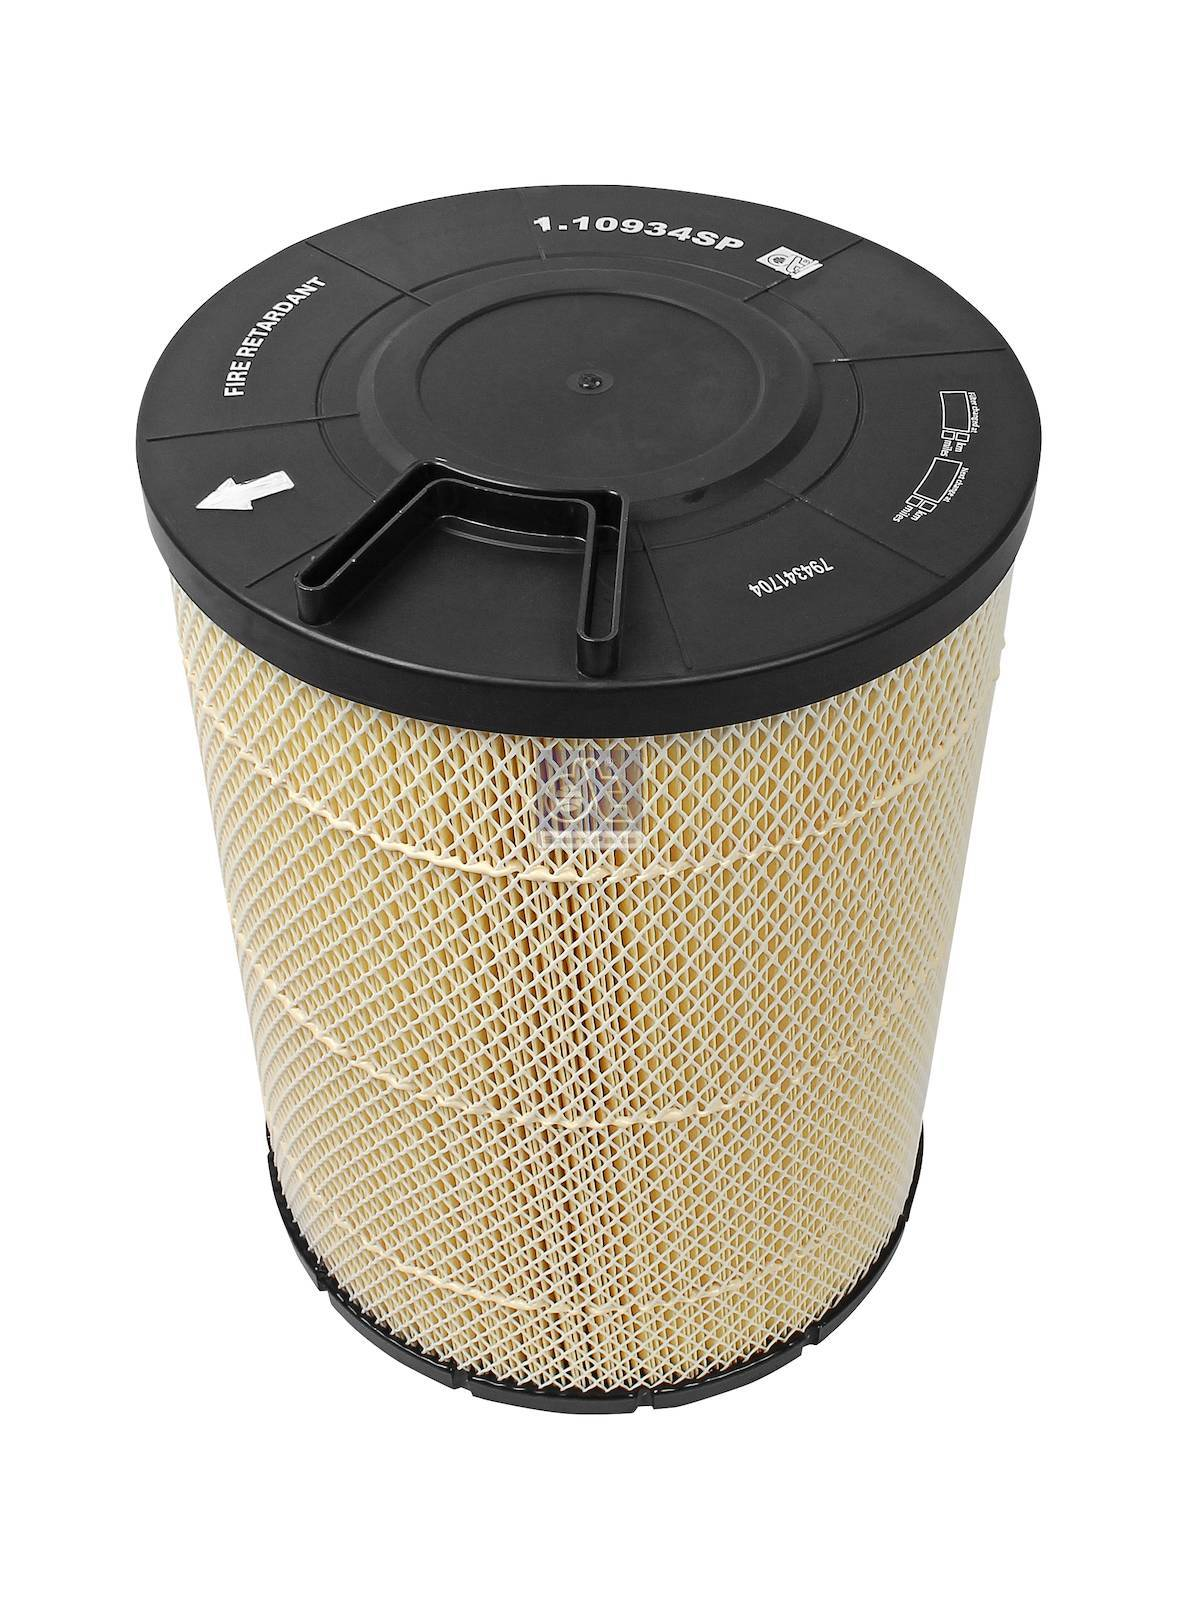 Air filter, flame retardant